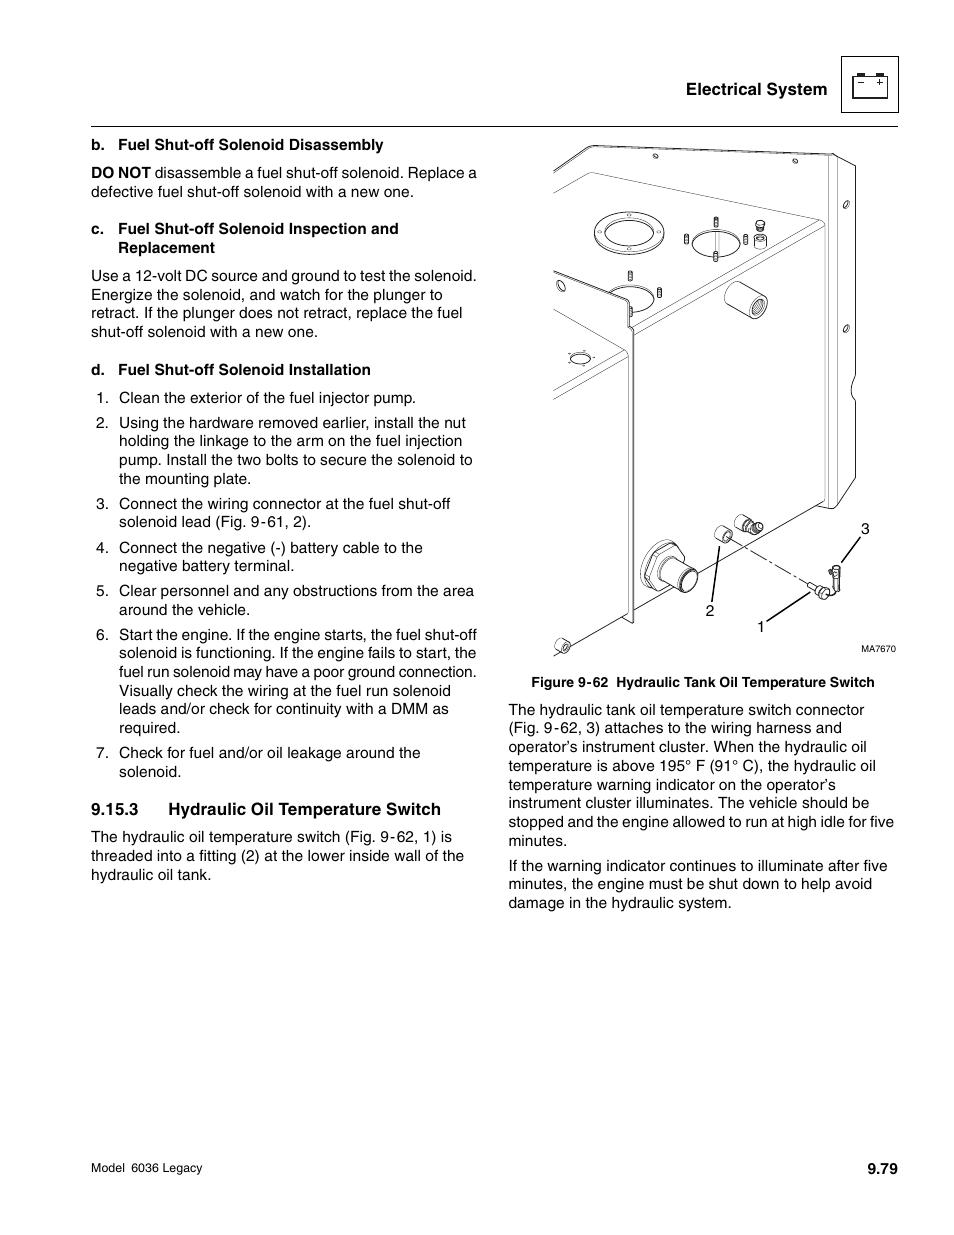 skytrak 6036 service manual related keywords suggestions skytrak 6036 service manual user page 431 460